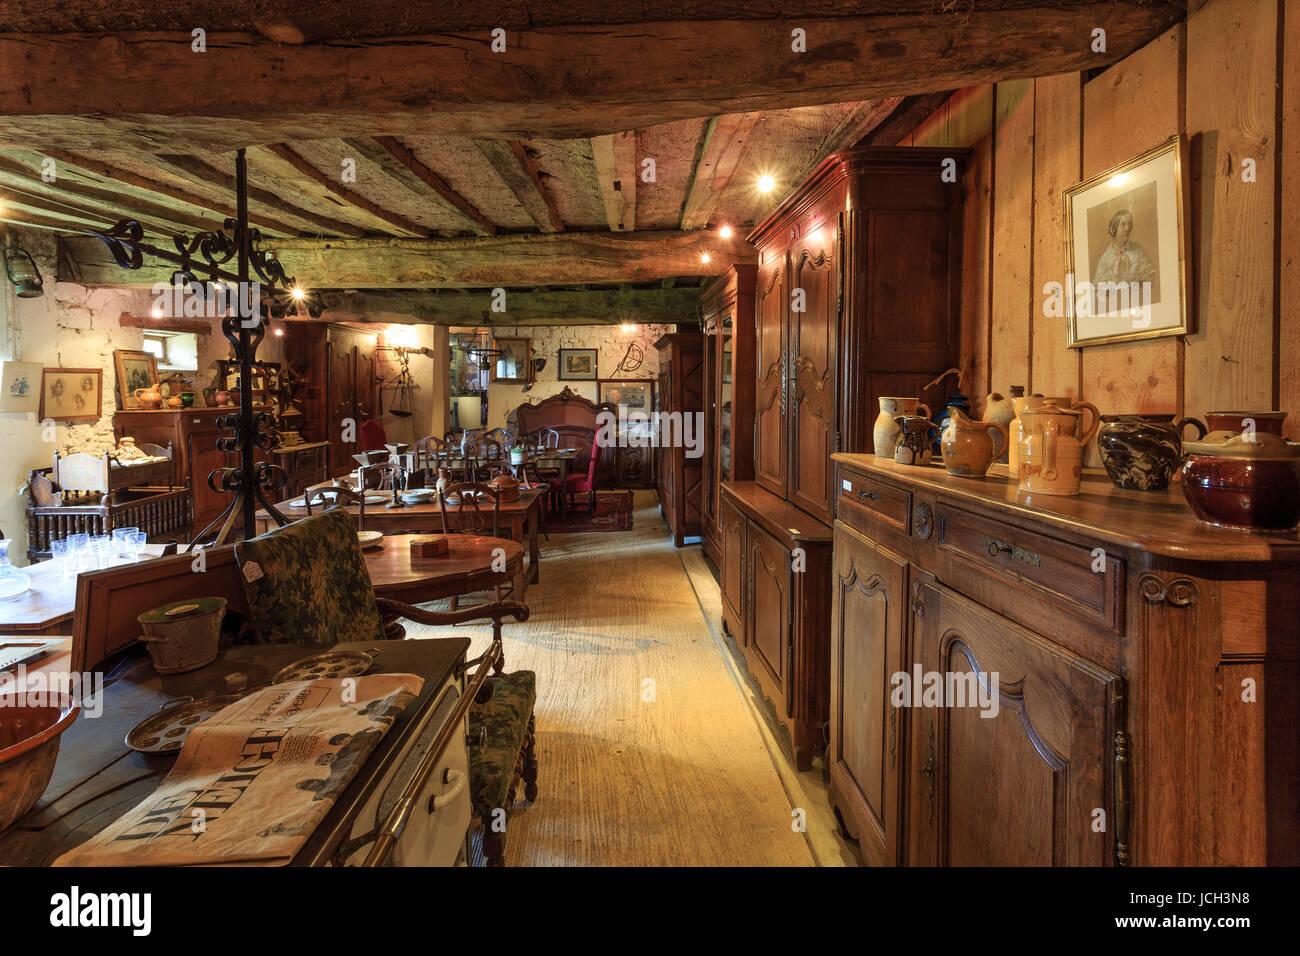 france orne 61 noc manoir de lormarin antiquit s dans les stock photo royalty free image. Black Bedroom Furniture Sets. Home Design Ideas